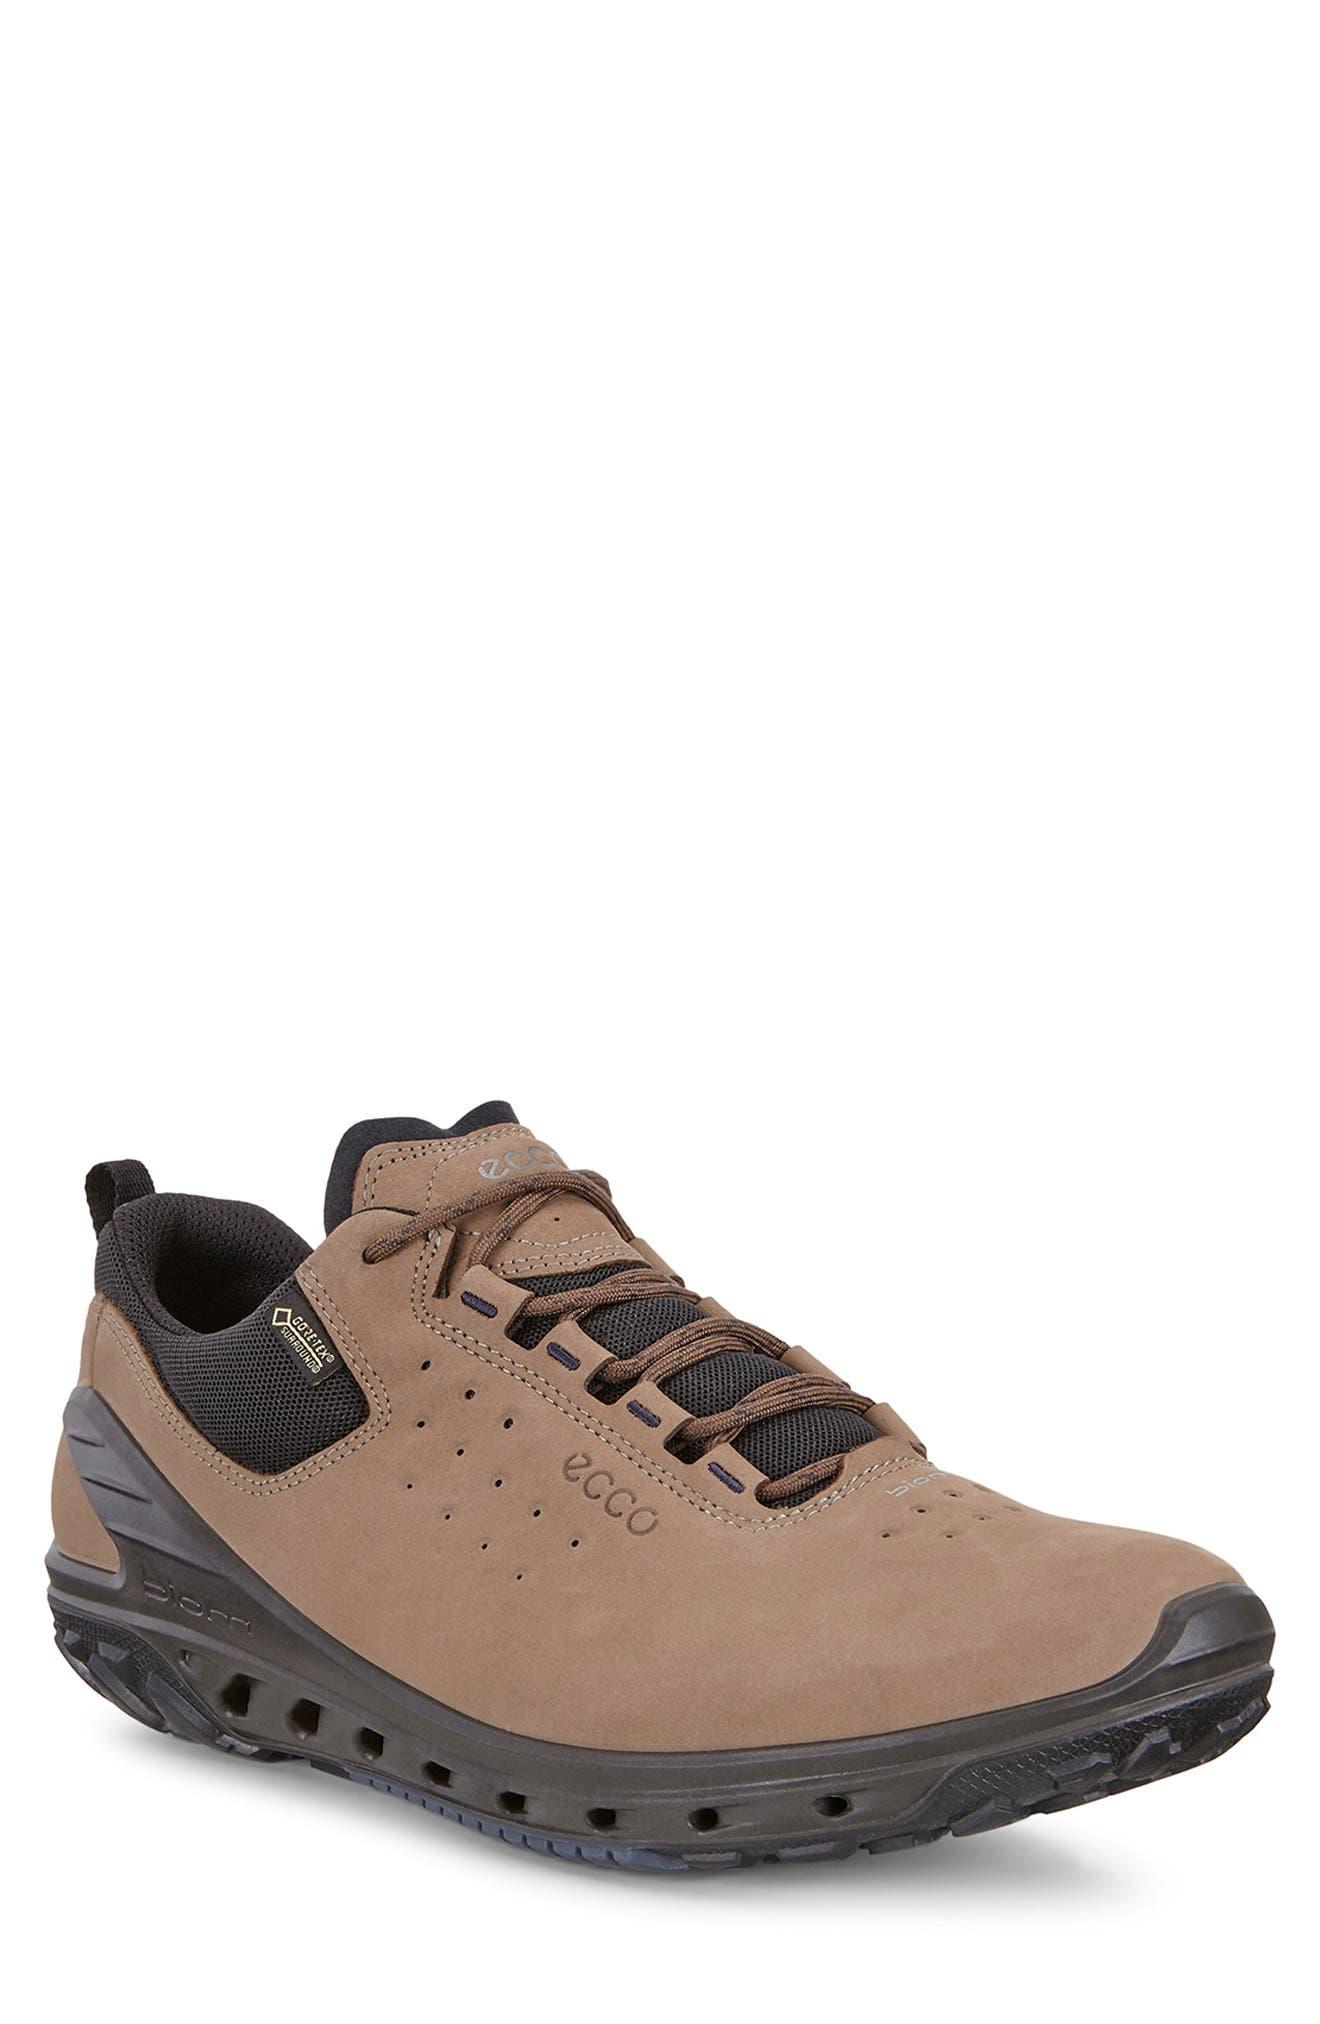 Biom Venture GTX Sneaker,                         Main,                         color, BIRCH BROWN LEATHER